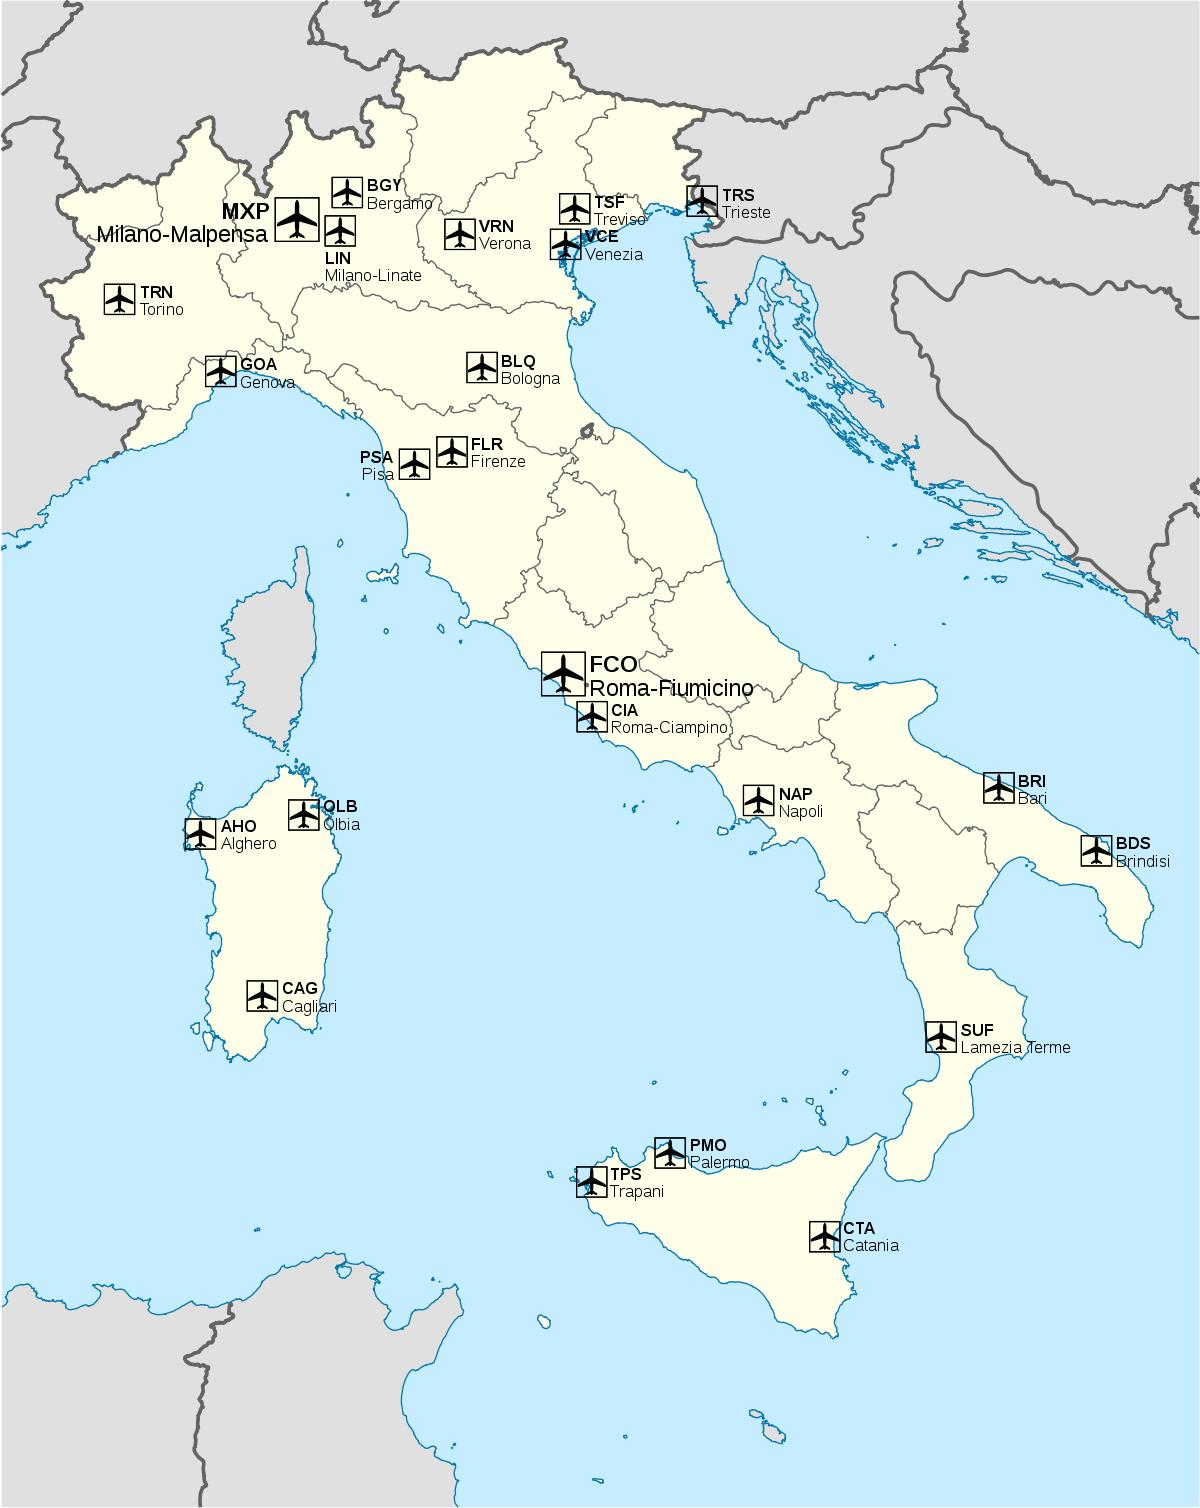 Italien Flughafen Map Internationale Flughafen In Italien Karte